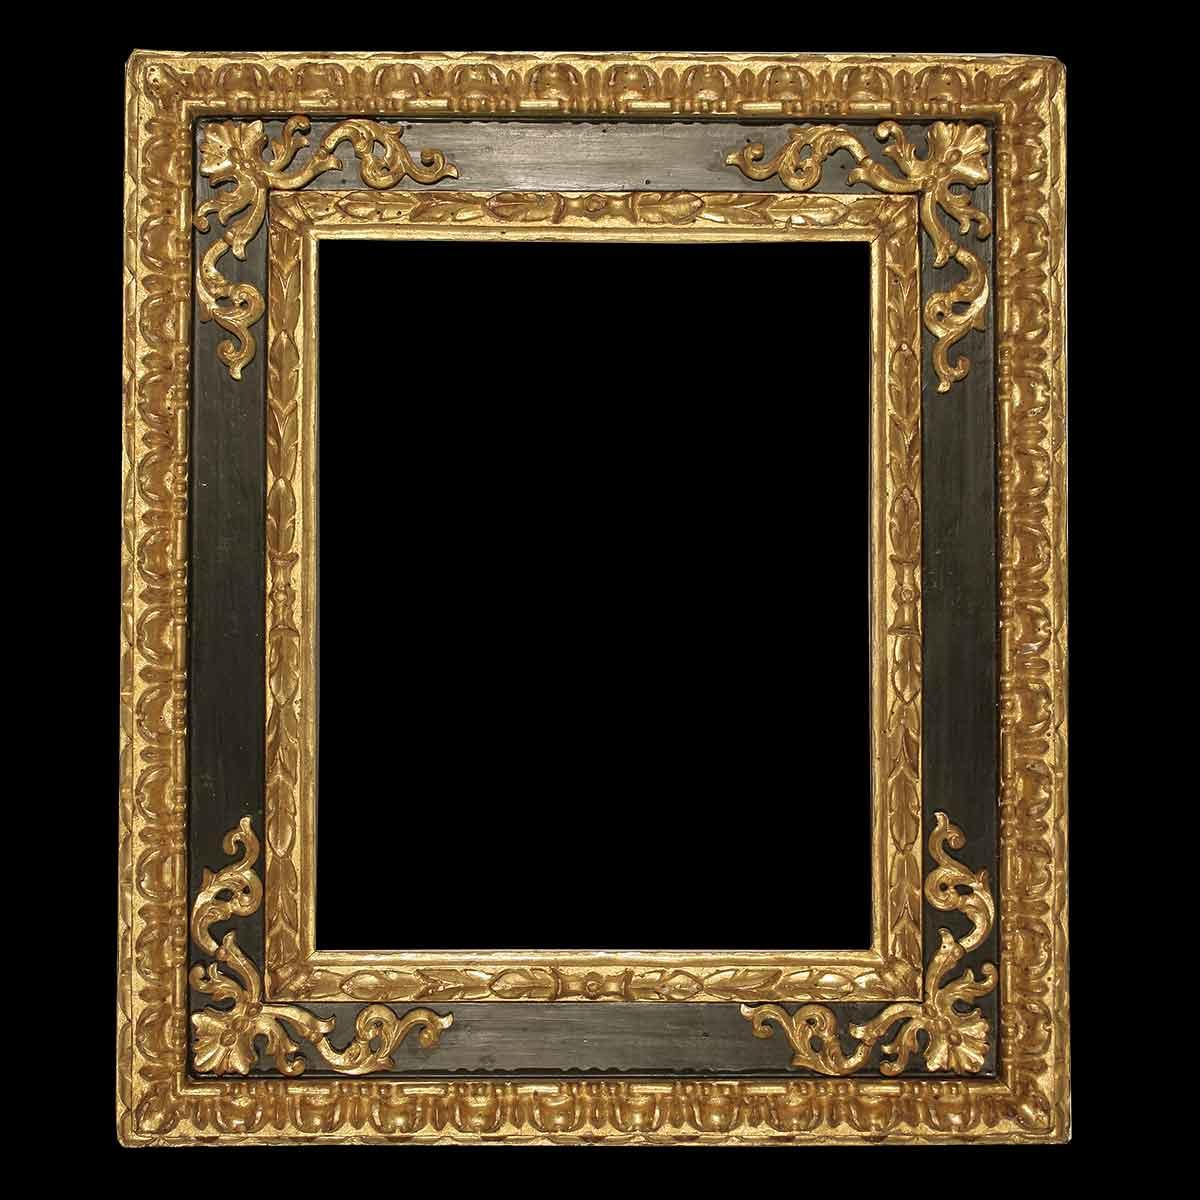 Renaissance Picture Frame Cod 05 Buy A Top Quality